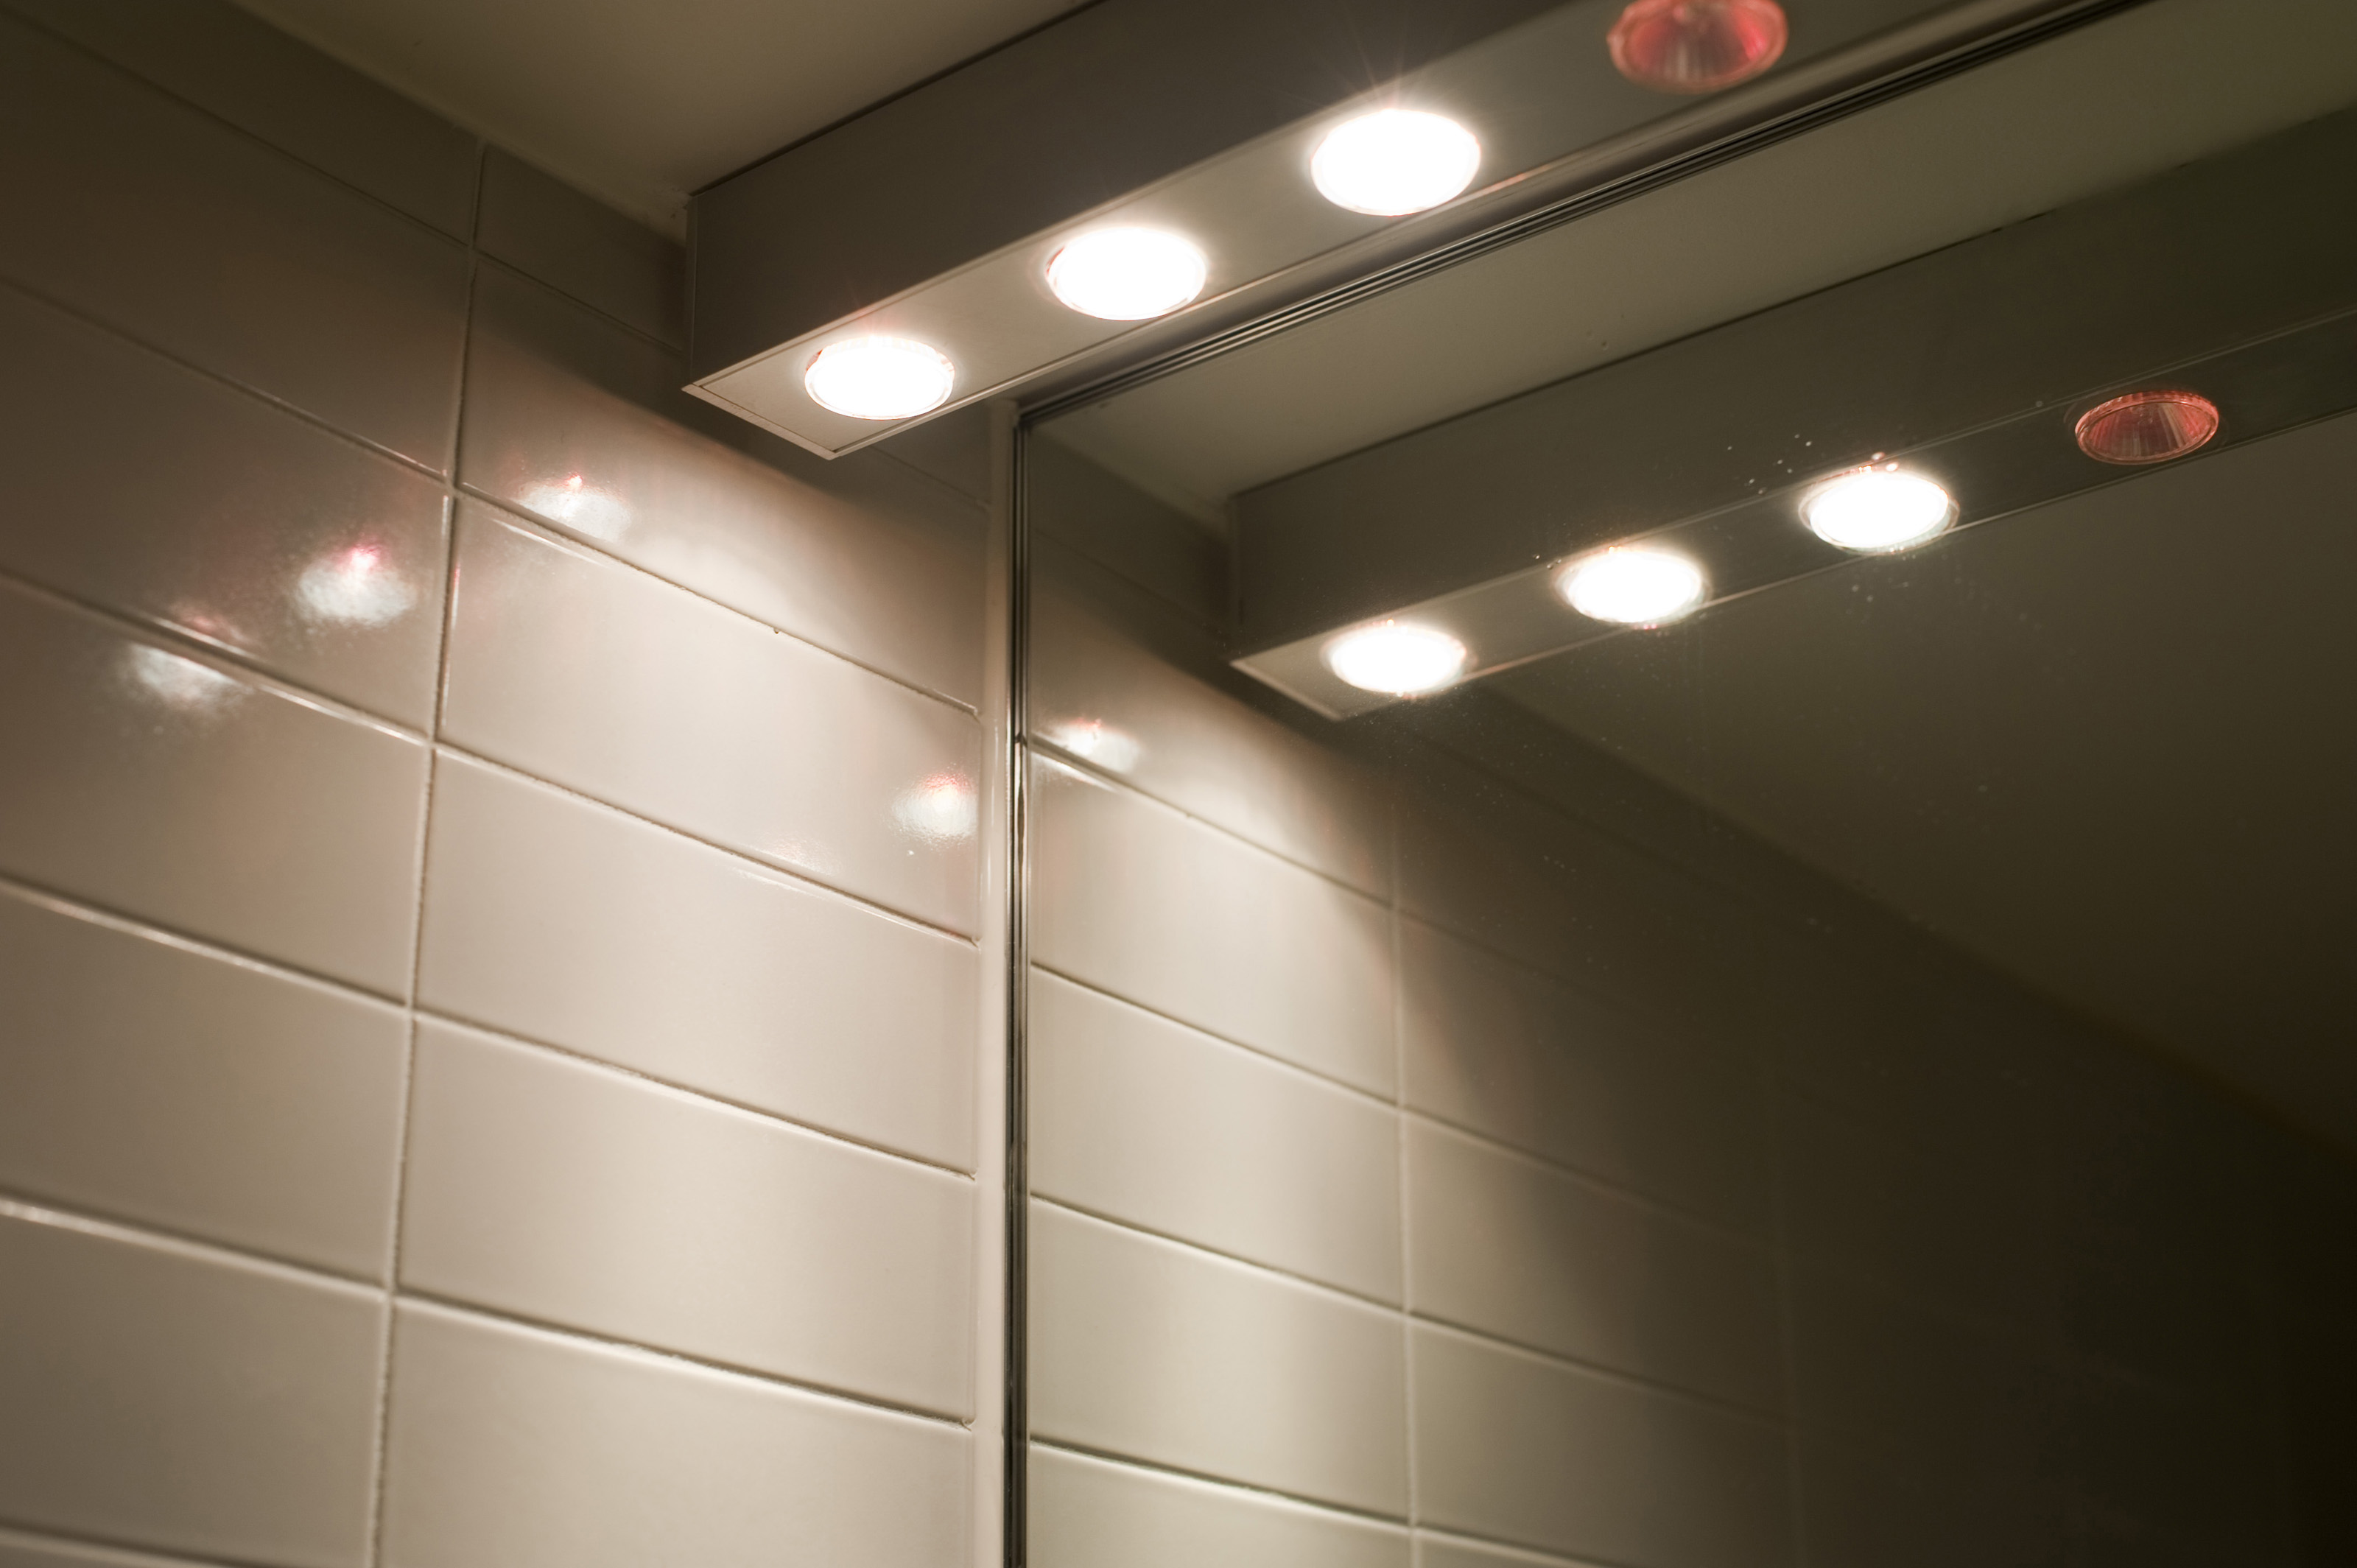 Free Image Of Electric Lighting